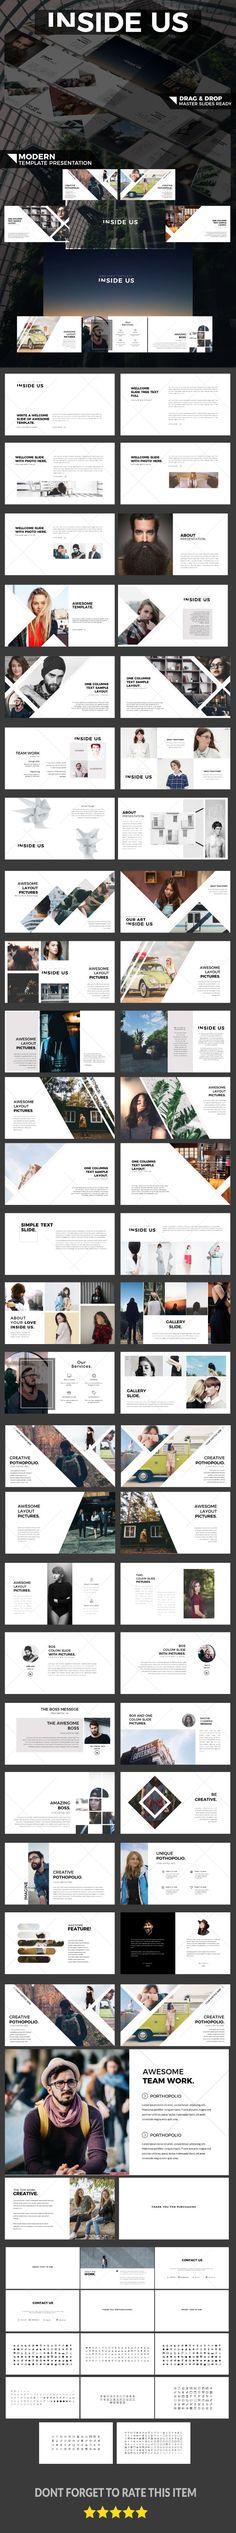 Gallia creative powerpoint template creative powerpoint data inside us modern presentation toneelgroepblik Images